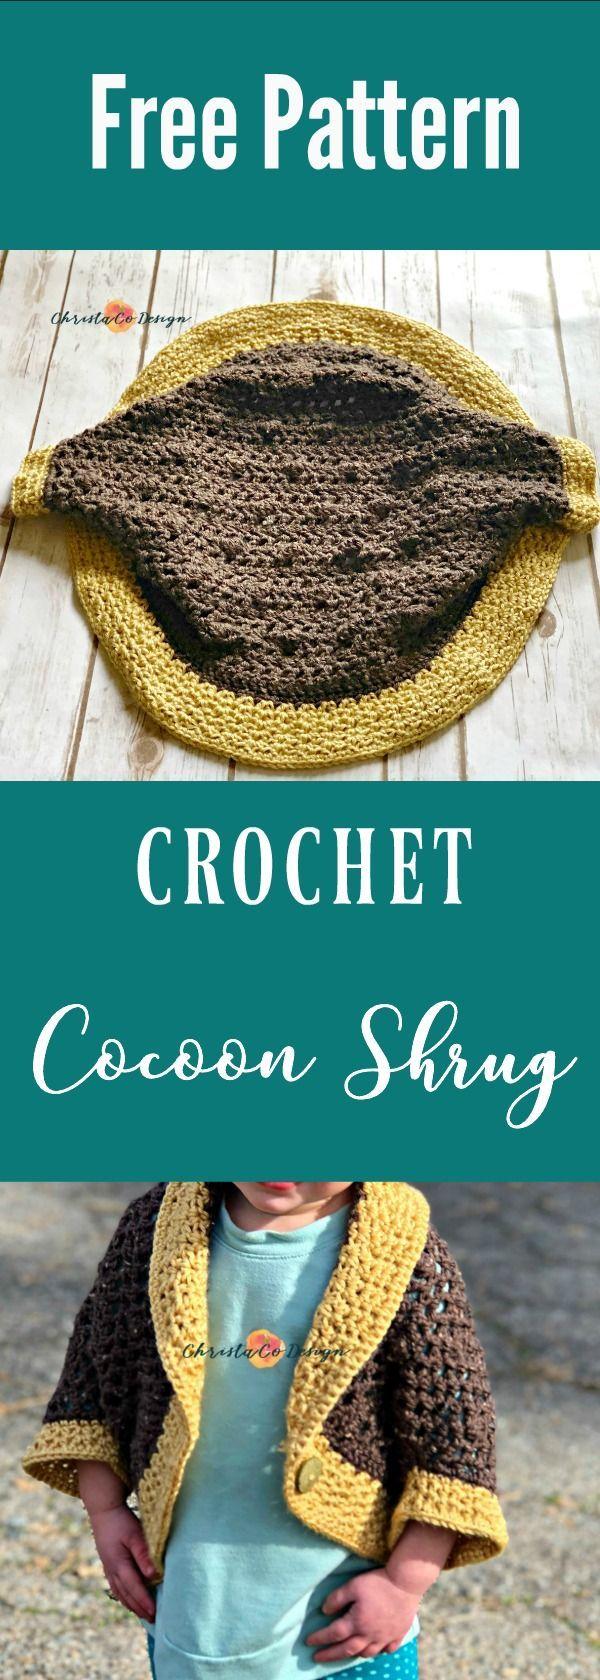 Toddler Crochet Cocoon Shrug Pattern | Crochet, Free crochet and ...